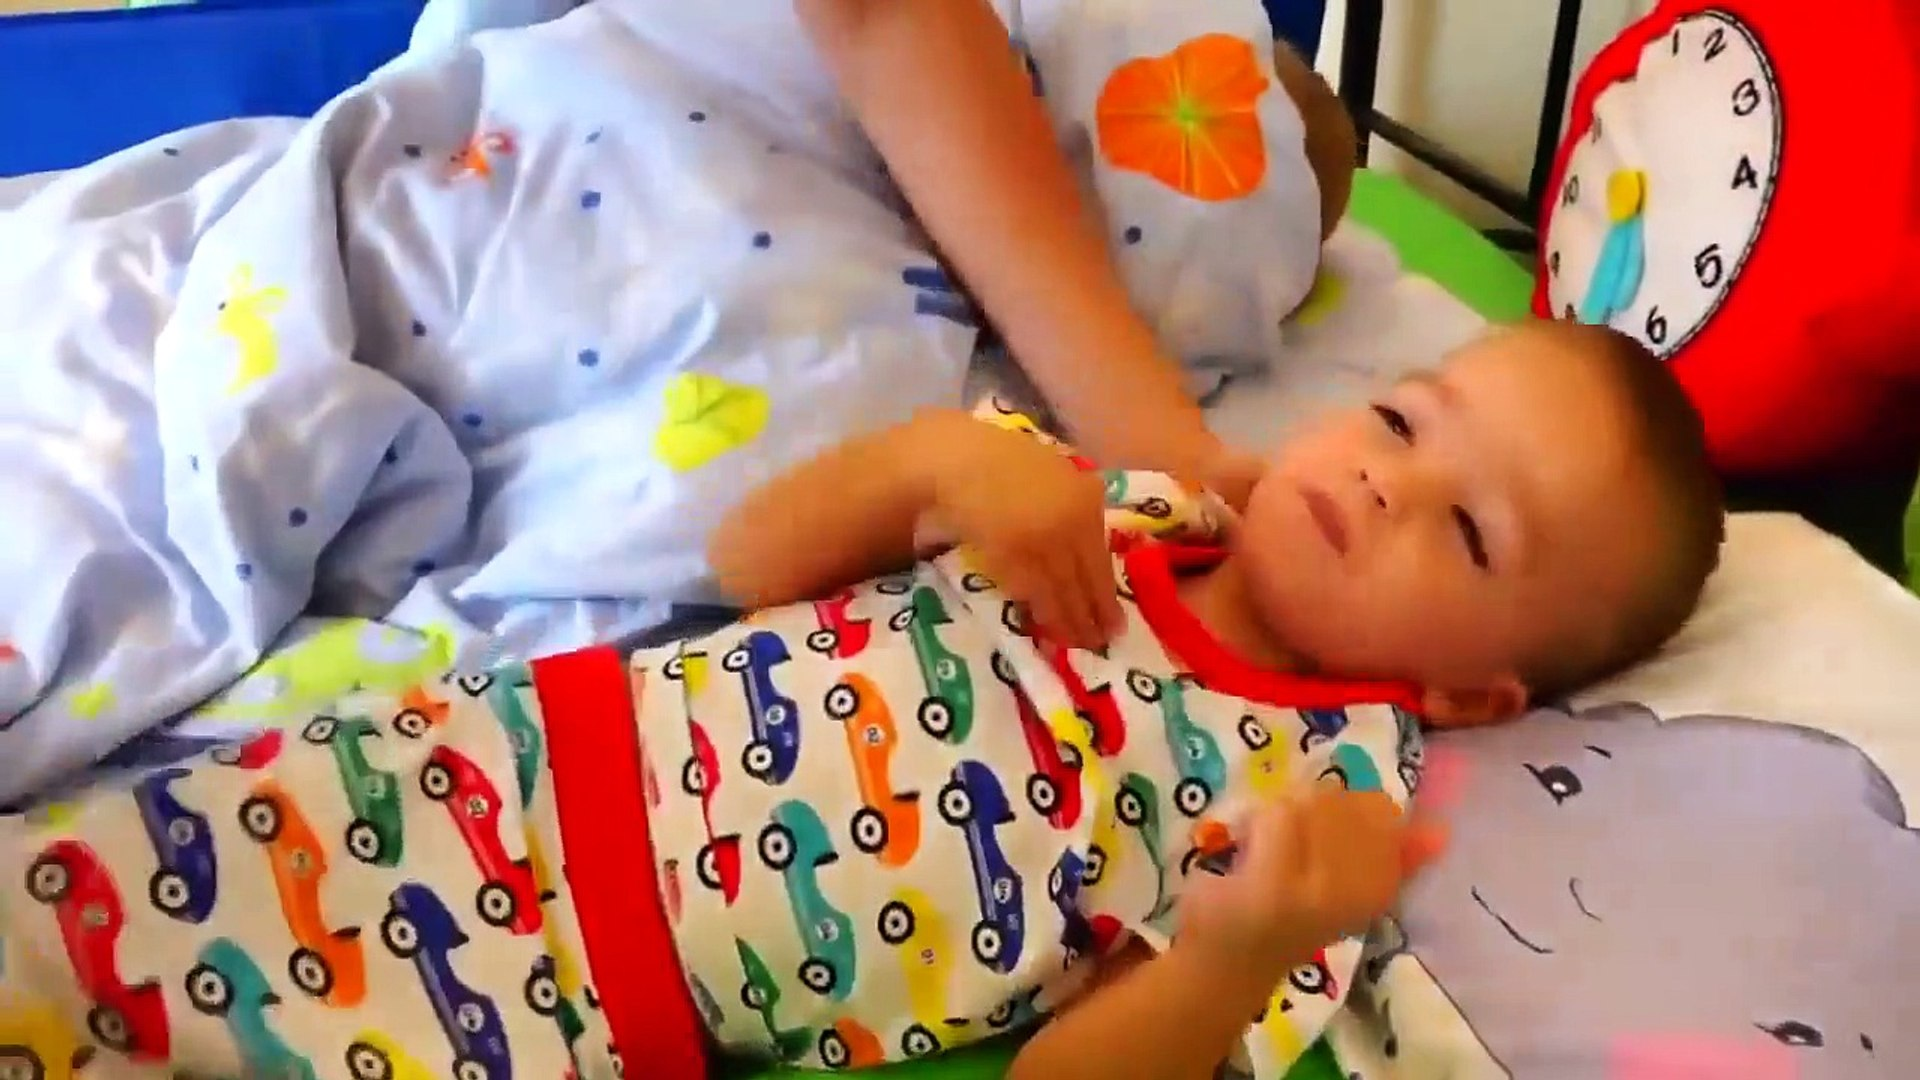 Vlad CrazyShow Влад Крези Шоу -  Bad Kids Вредные детки Giant Candy Lollipops! Johny Johny Yes Papa Song Конфеты